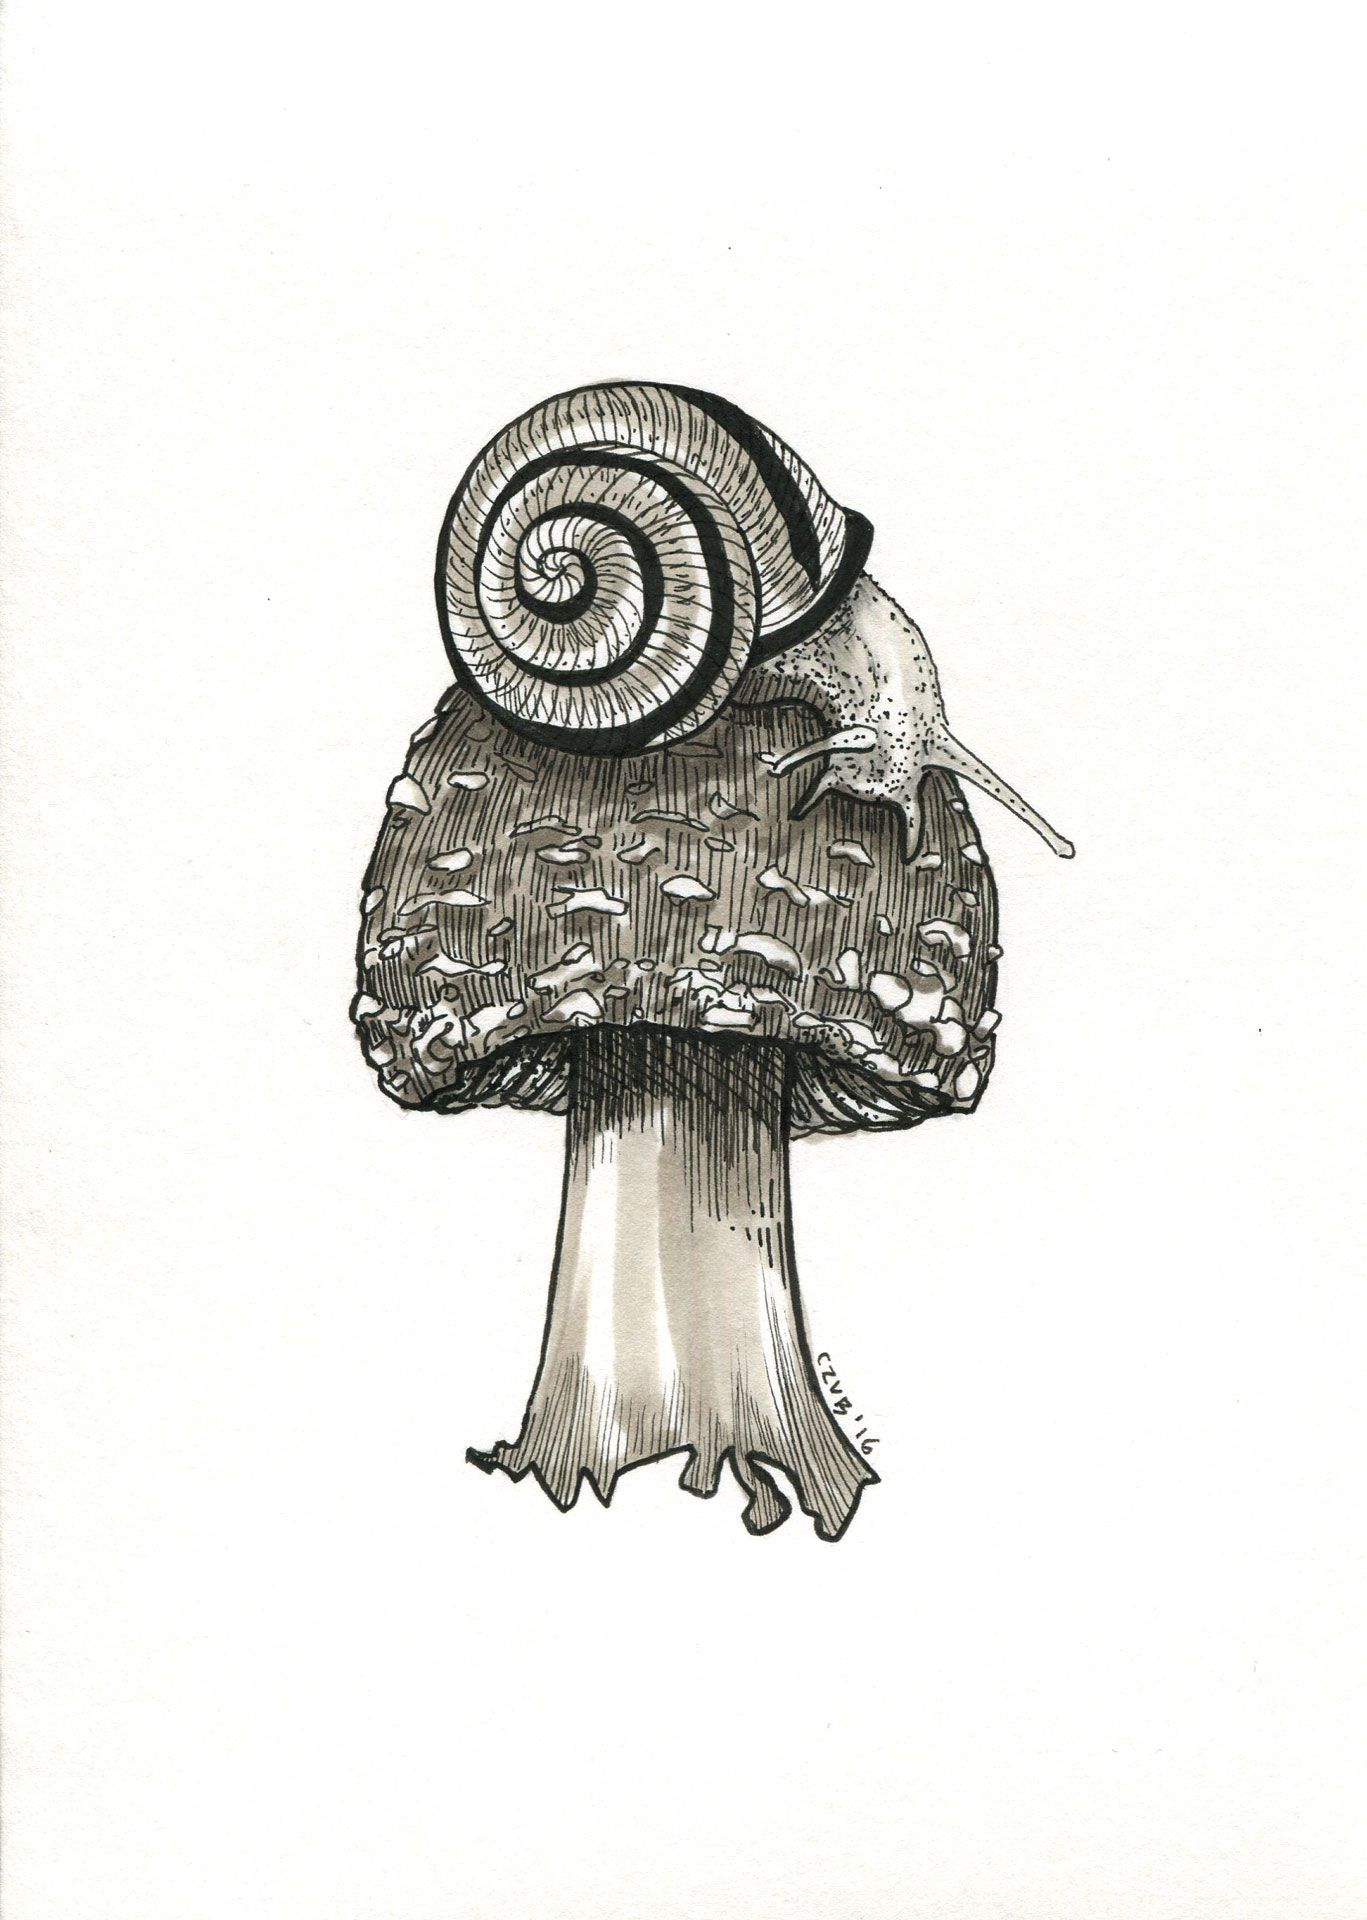 #snail #mashroom #black and white #drawing #illustration #tattoo #design